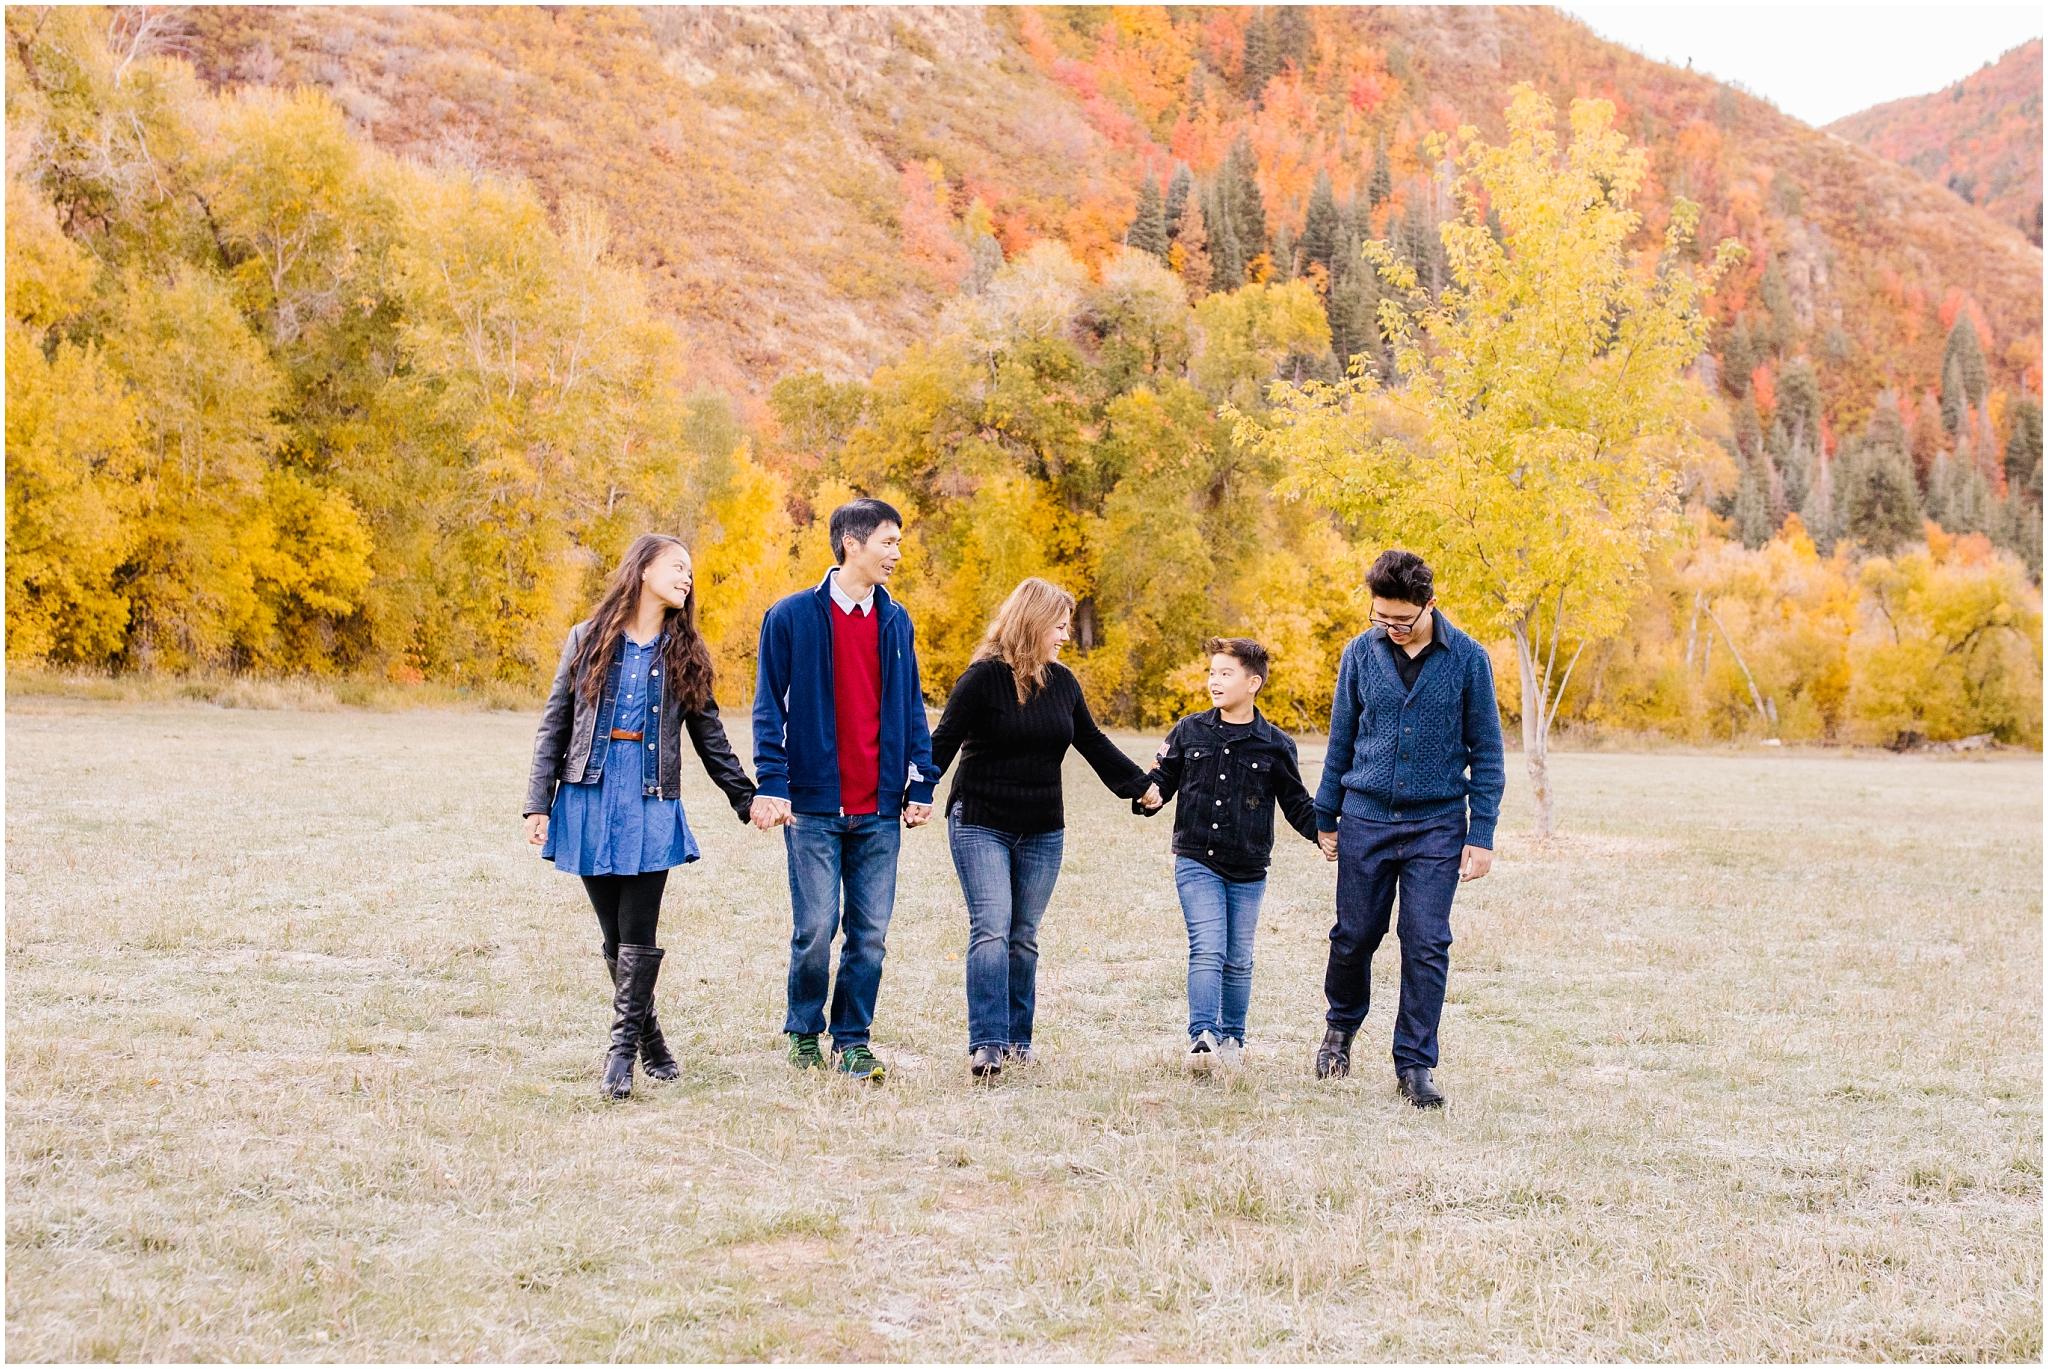 Qian-33_Lizzie-B-Imagery-Utah-Family-Photographer-Salt-Lake-City-Park-City-Utah-County-Hobble-Creek-Canyon-Jolleys-Ranch.jpg